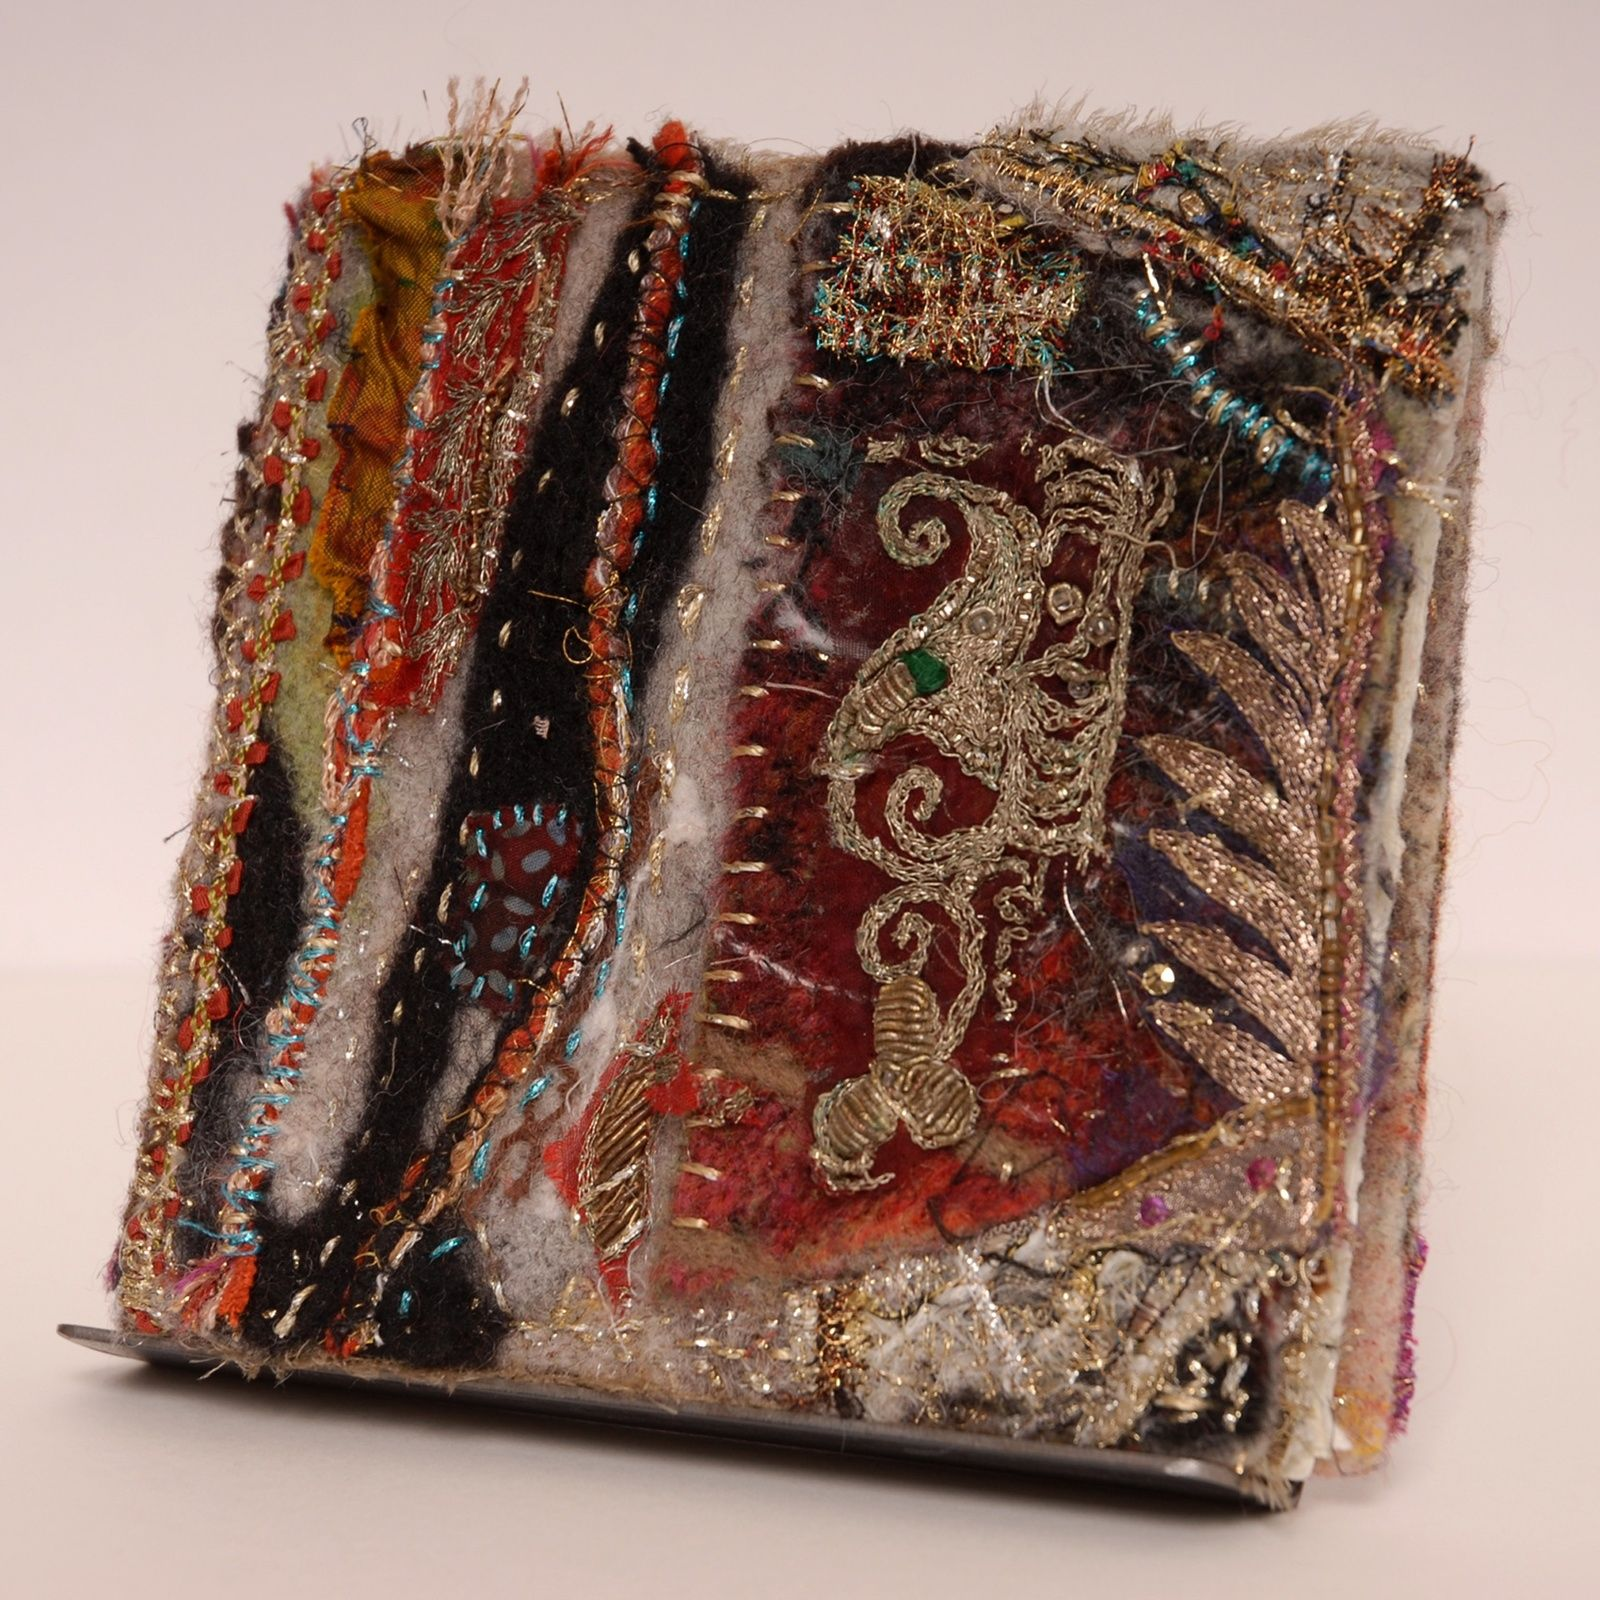 Gallery - Melanie Siegel's Portfolio